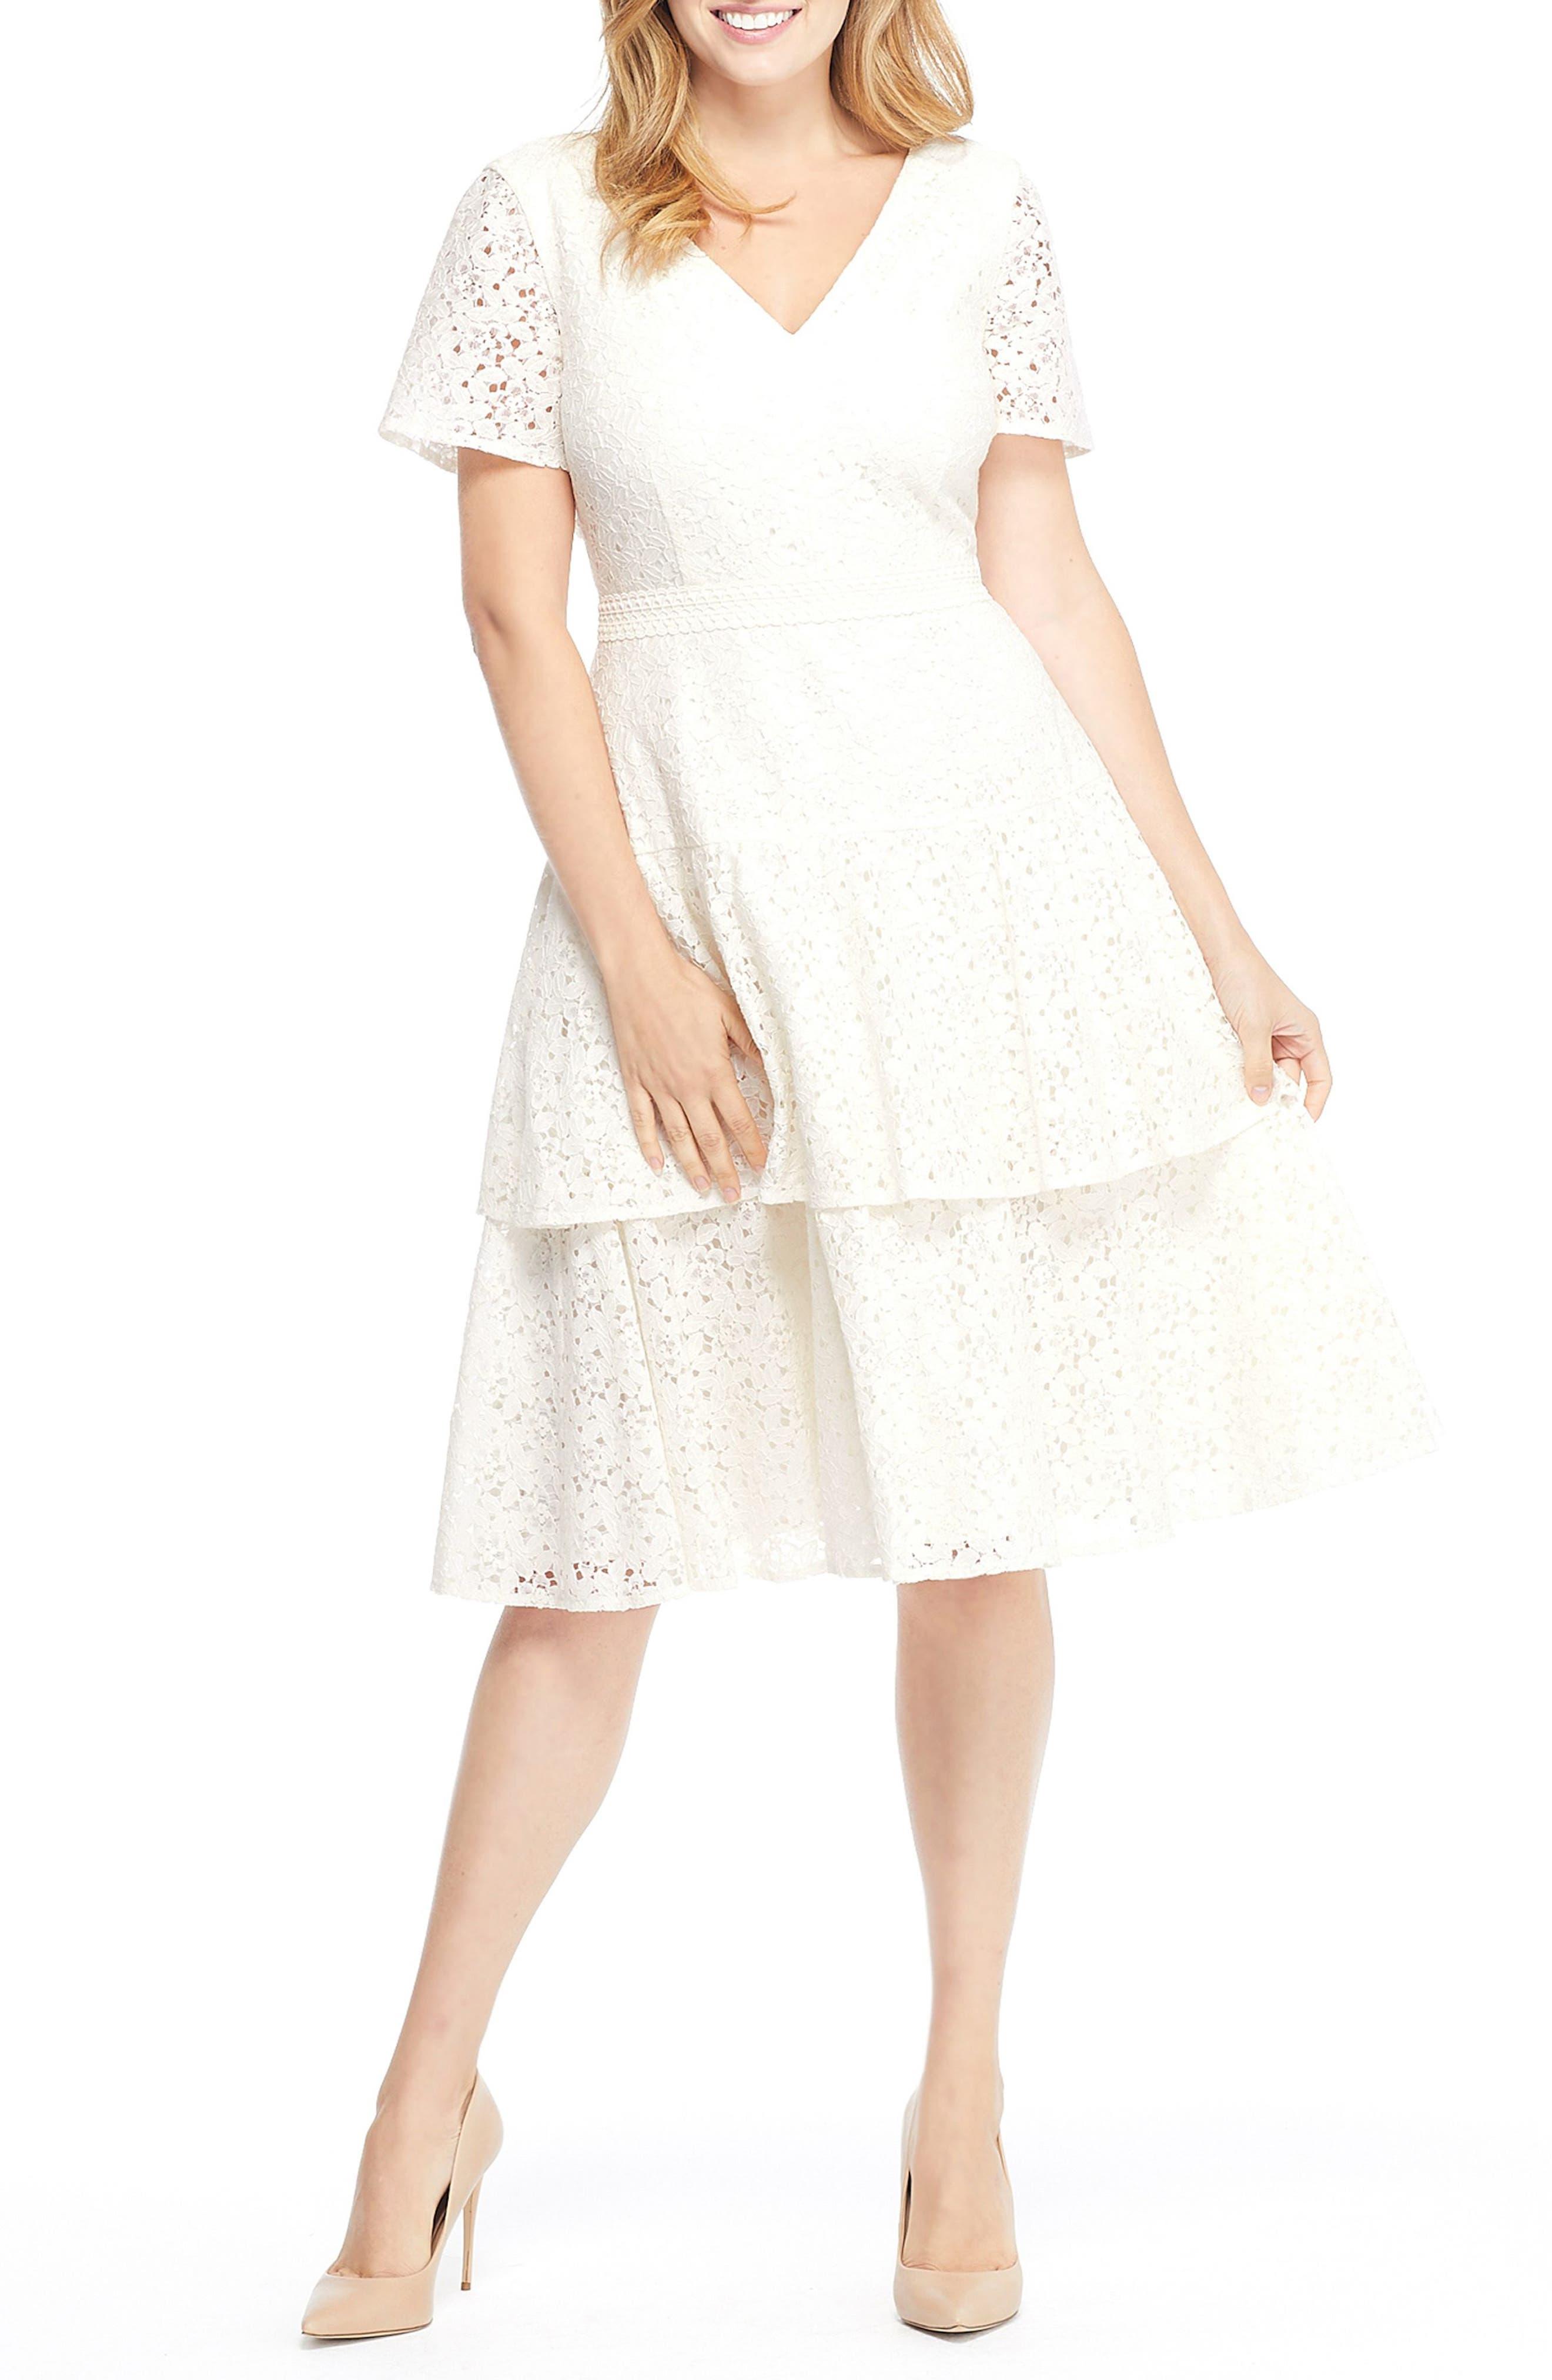 Doris Bow Back Tiered Skirt Lace Dress,                             Main thumbnail 1, color,                             CREAM